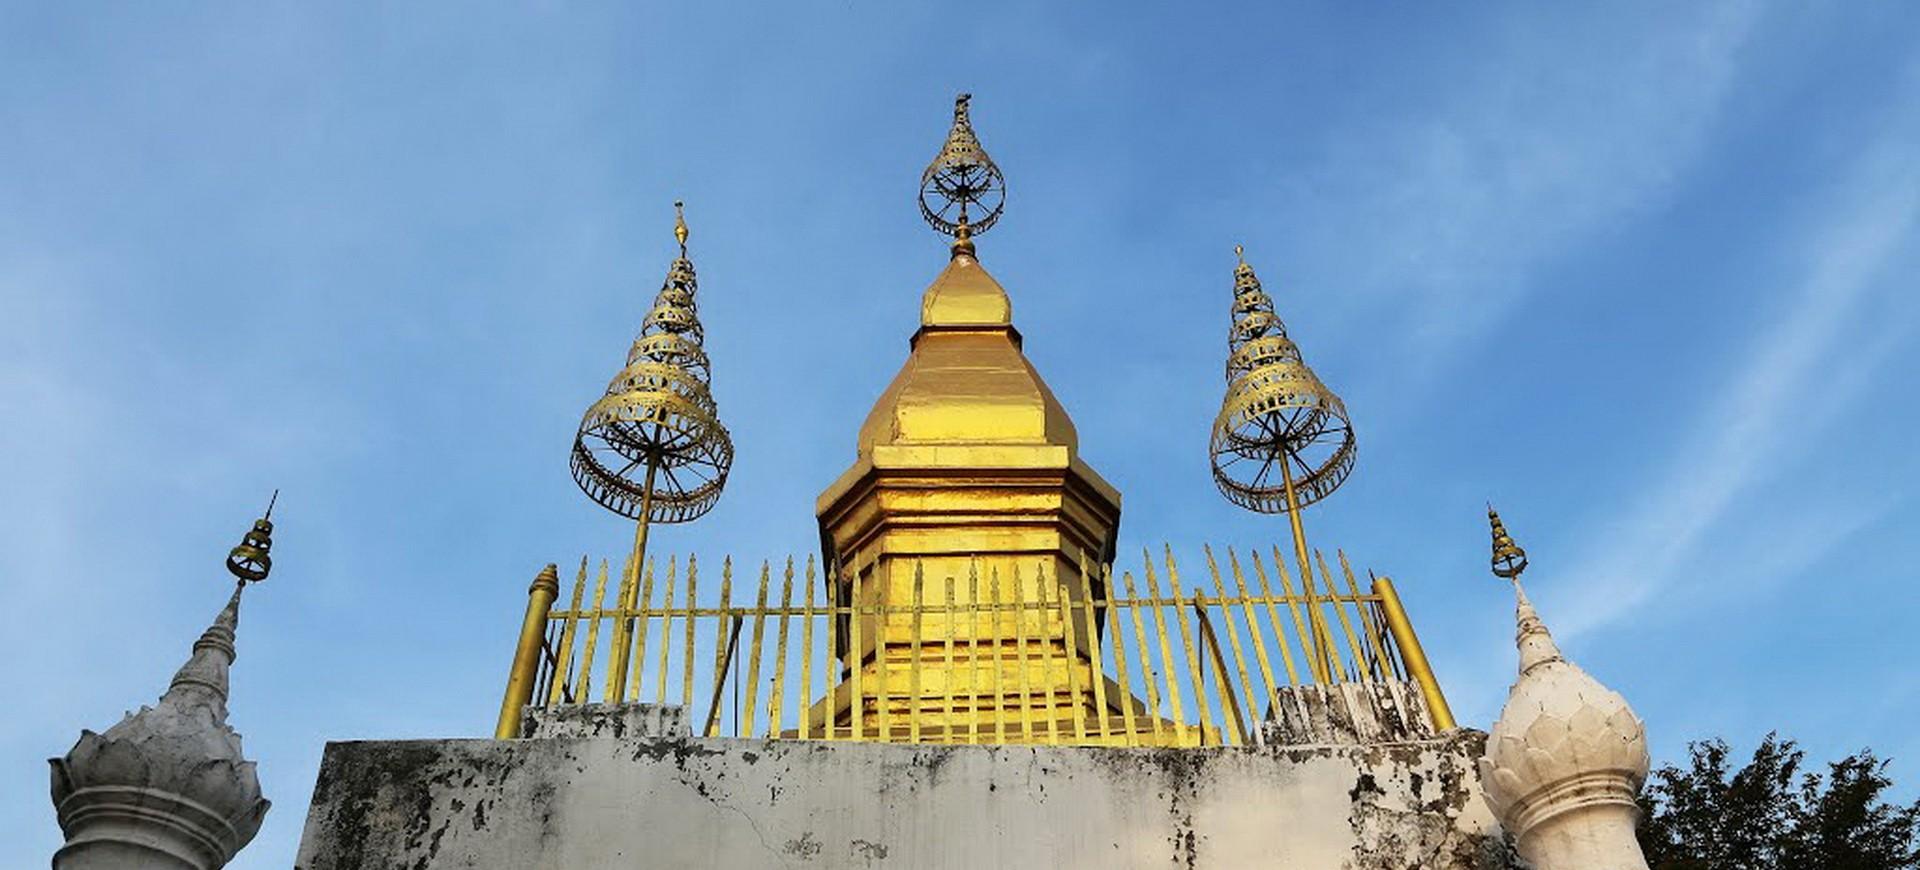 Luang Prabang Phousi au Laos